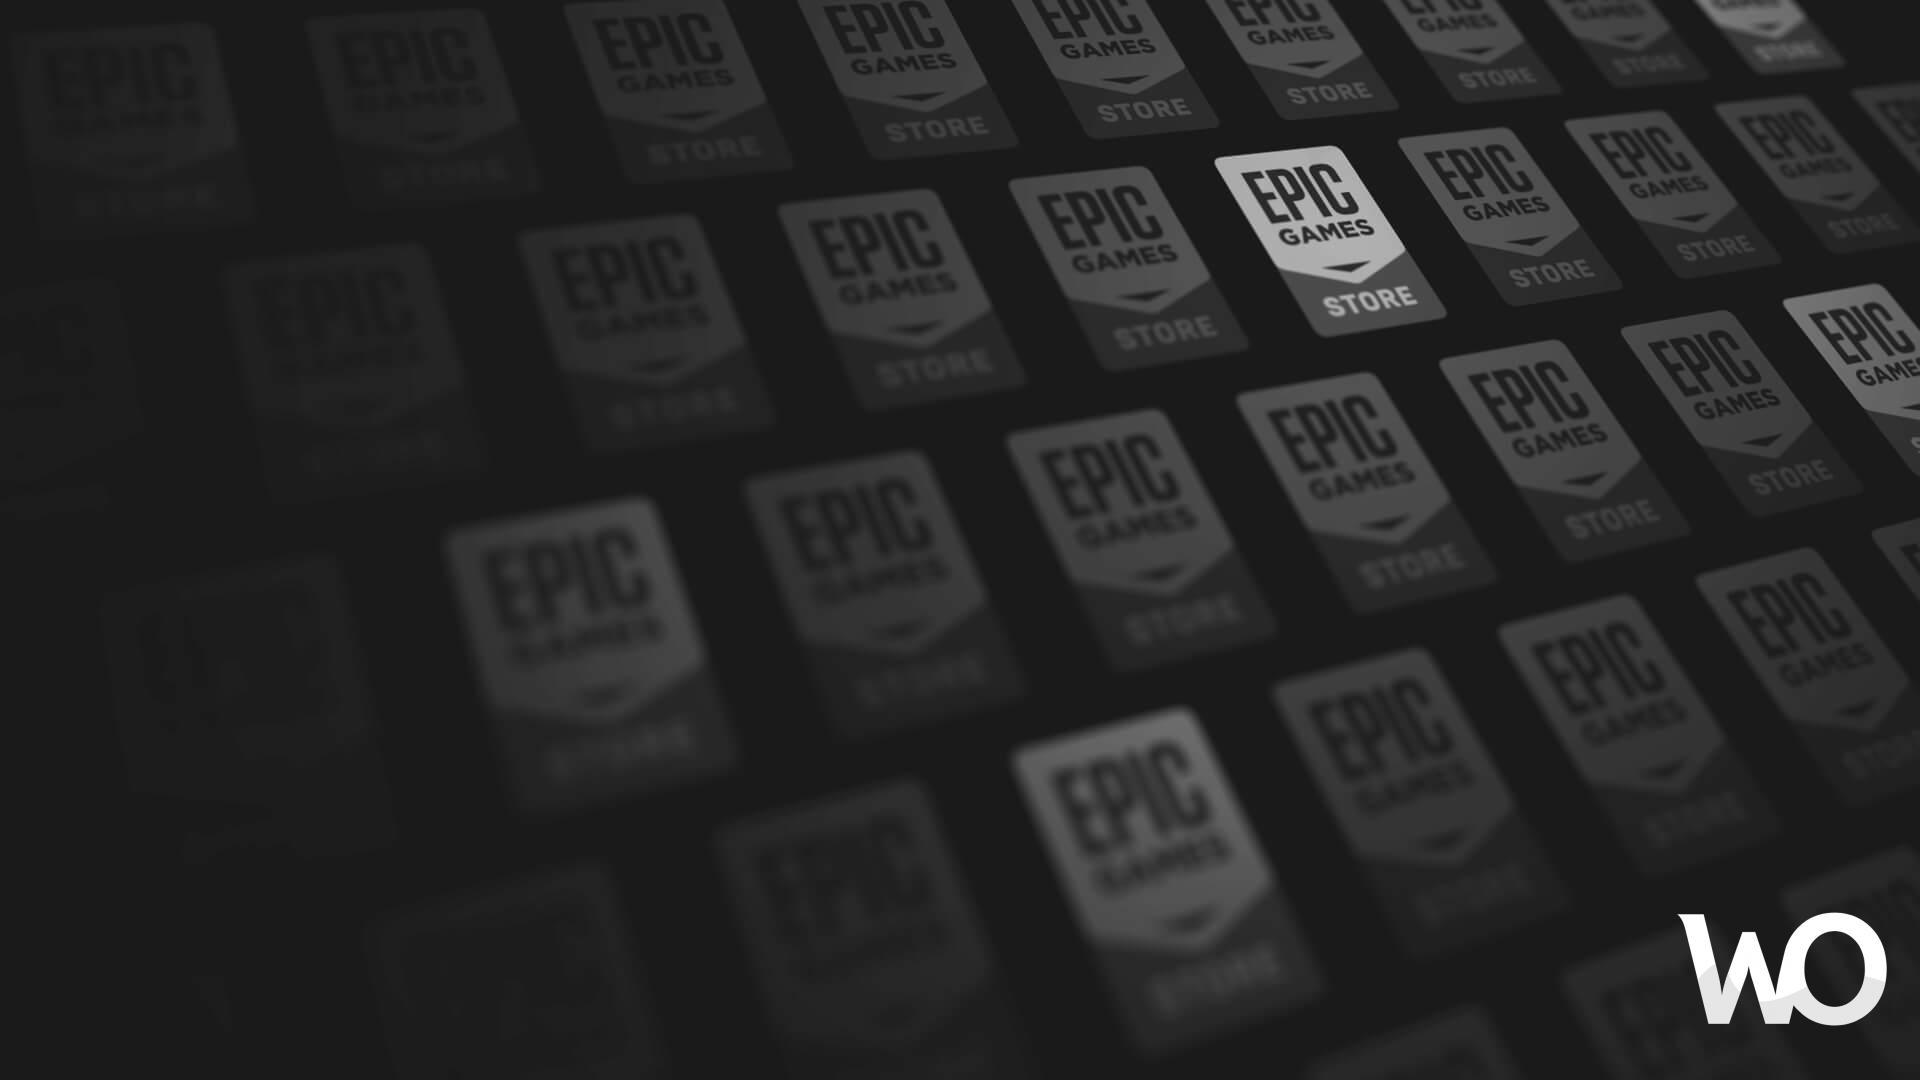 Epic Games Store'a Yeni Bir Özellik Eklendi